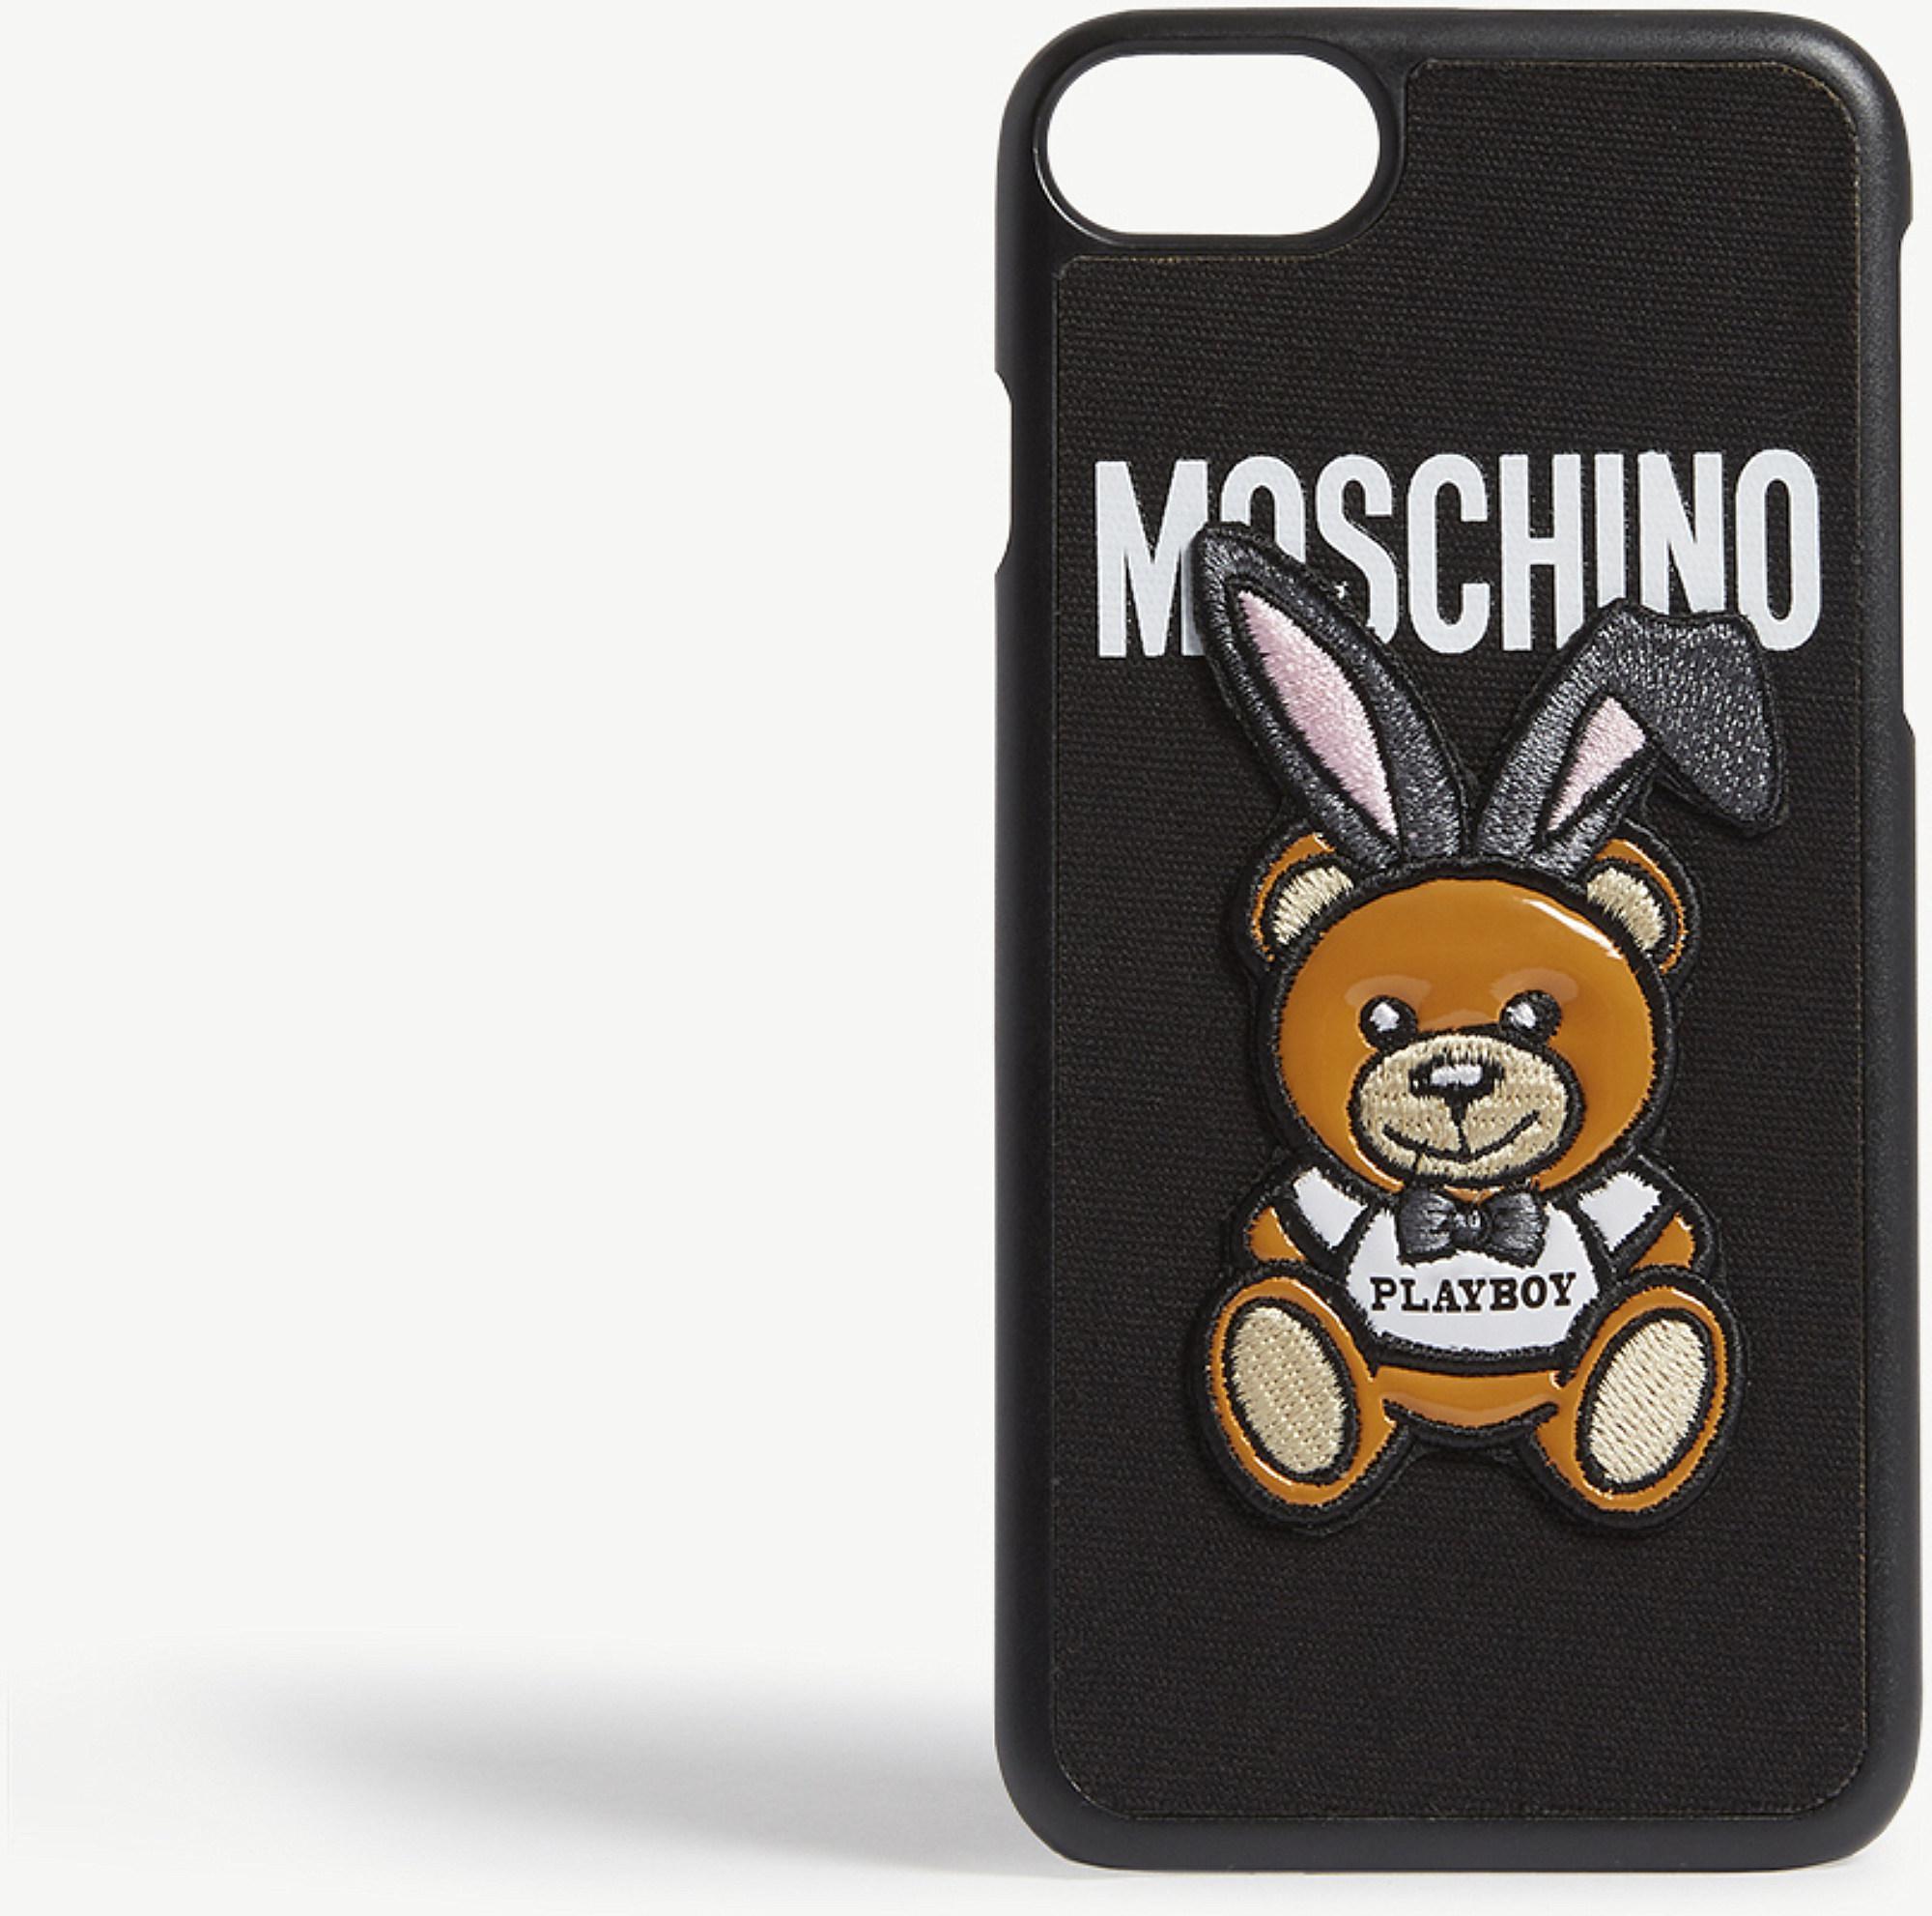 online store de8e3 e1e4f Moschino Black Playboy Teddy Iphone 7 Case